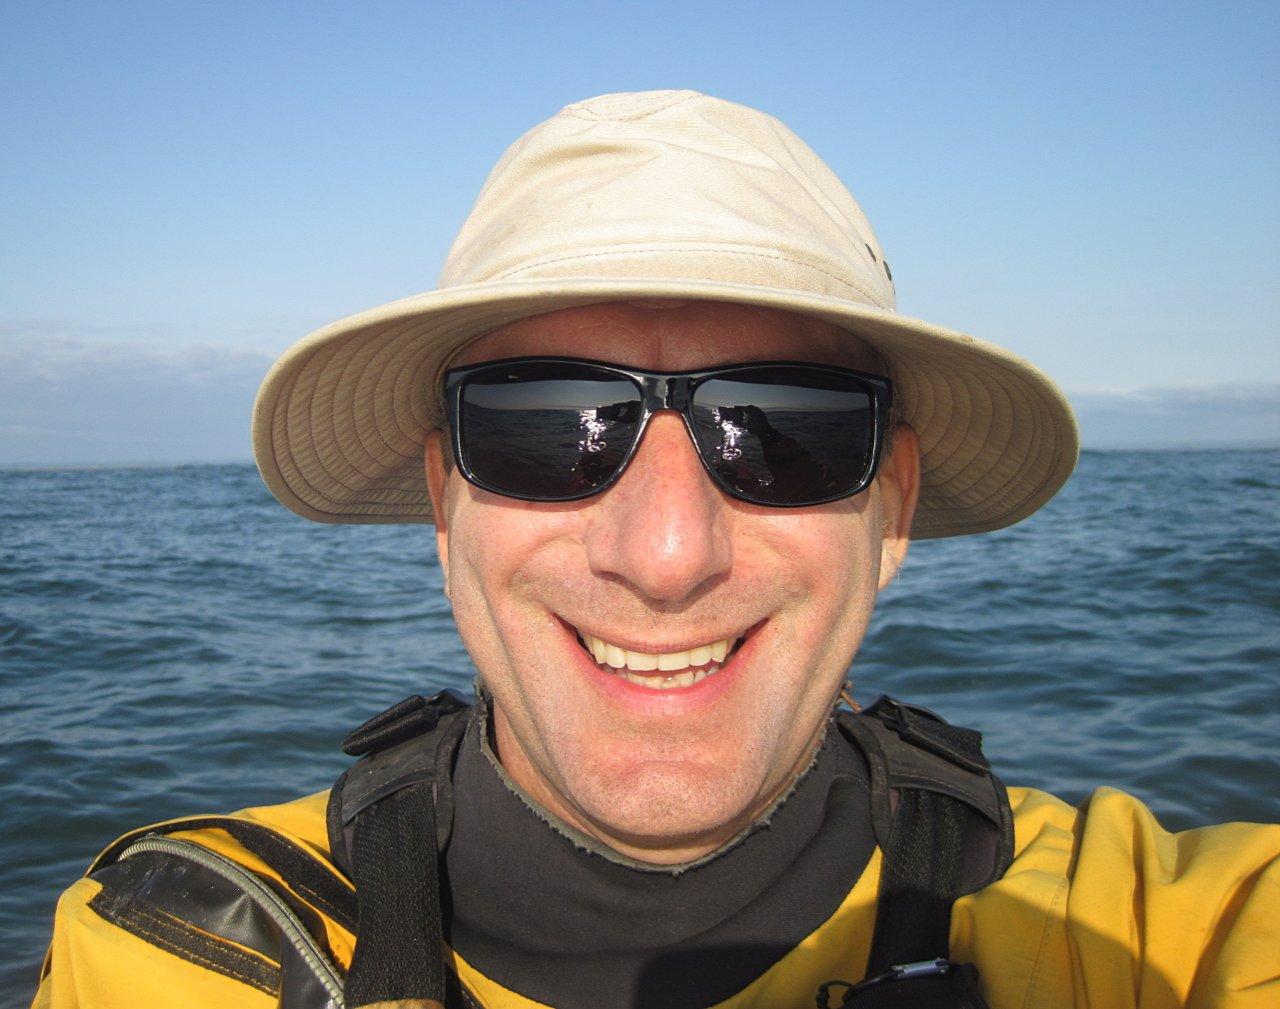 02 Alex kayaking out to sea.jpg